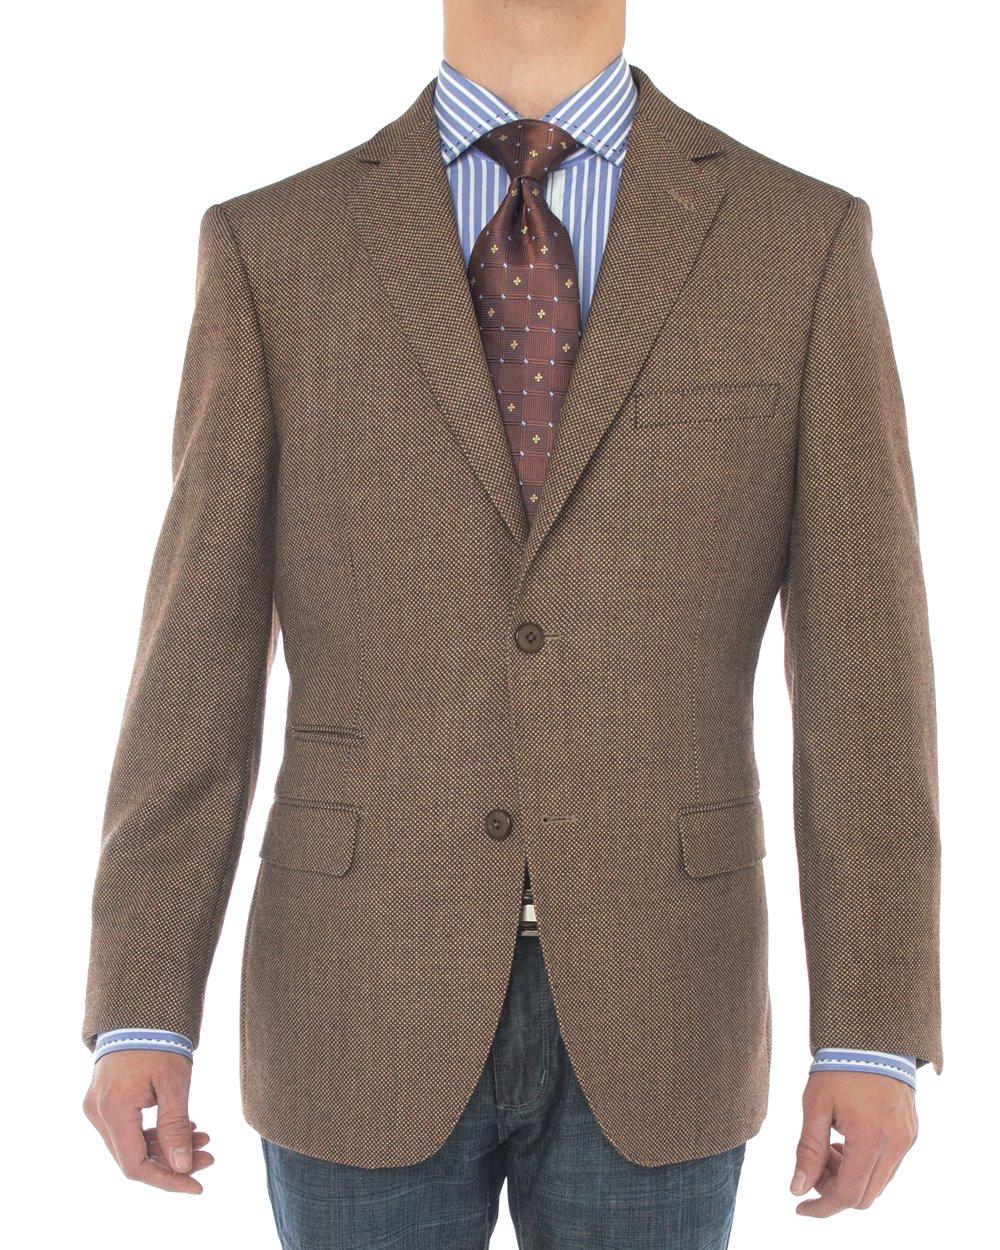 Luciano Natazzi Mens 2 Button 160'S Wool Blazer Working Button Holes Suit Jacket (44 Long US / 54 Long EU, Brown)